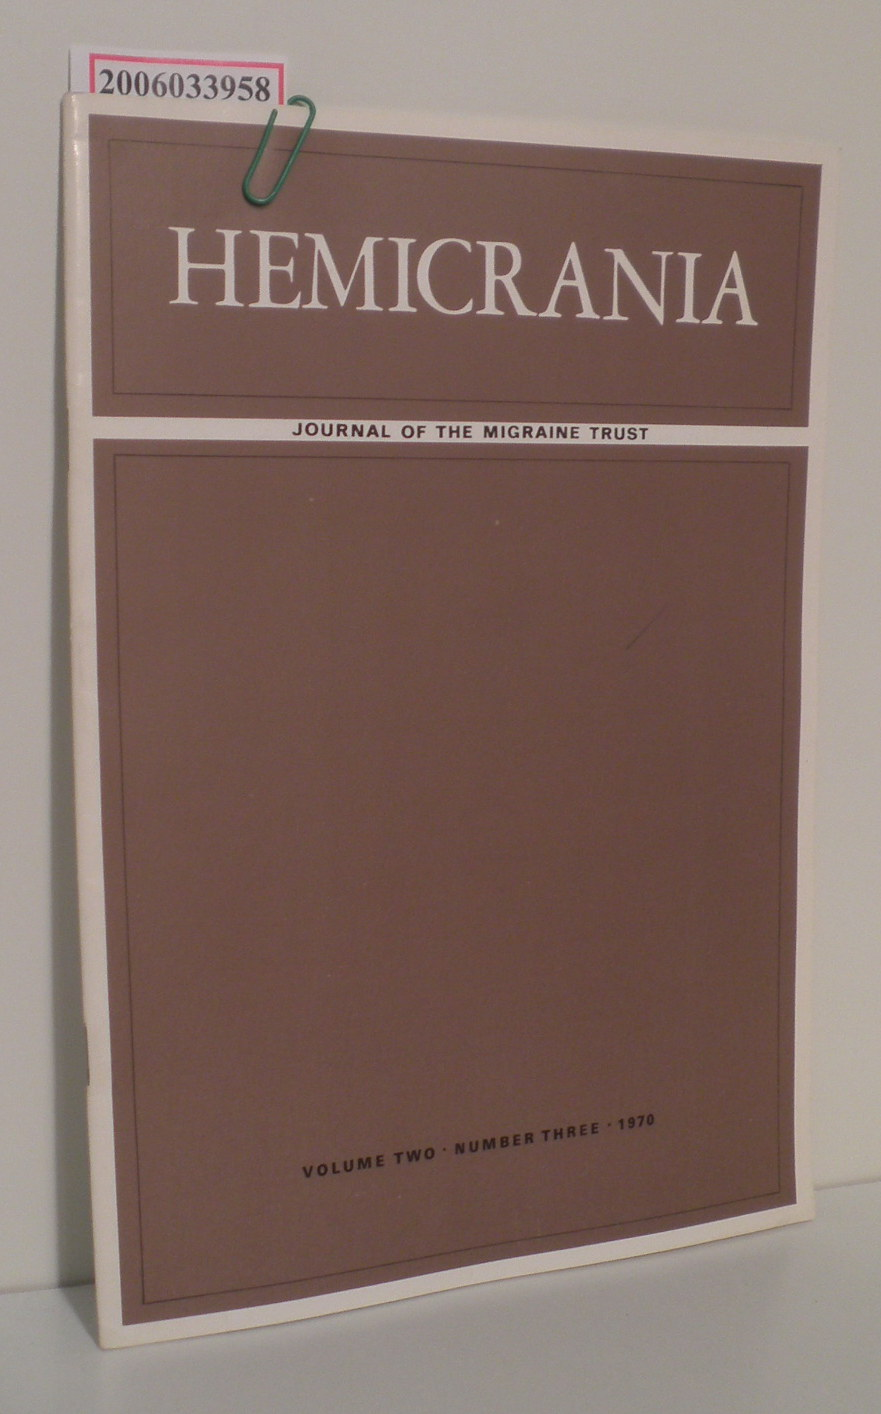 HEMICRANIA - Volume two * Number three * 1970 Journal of the Migraine Trust